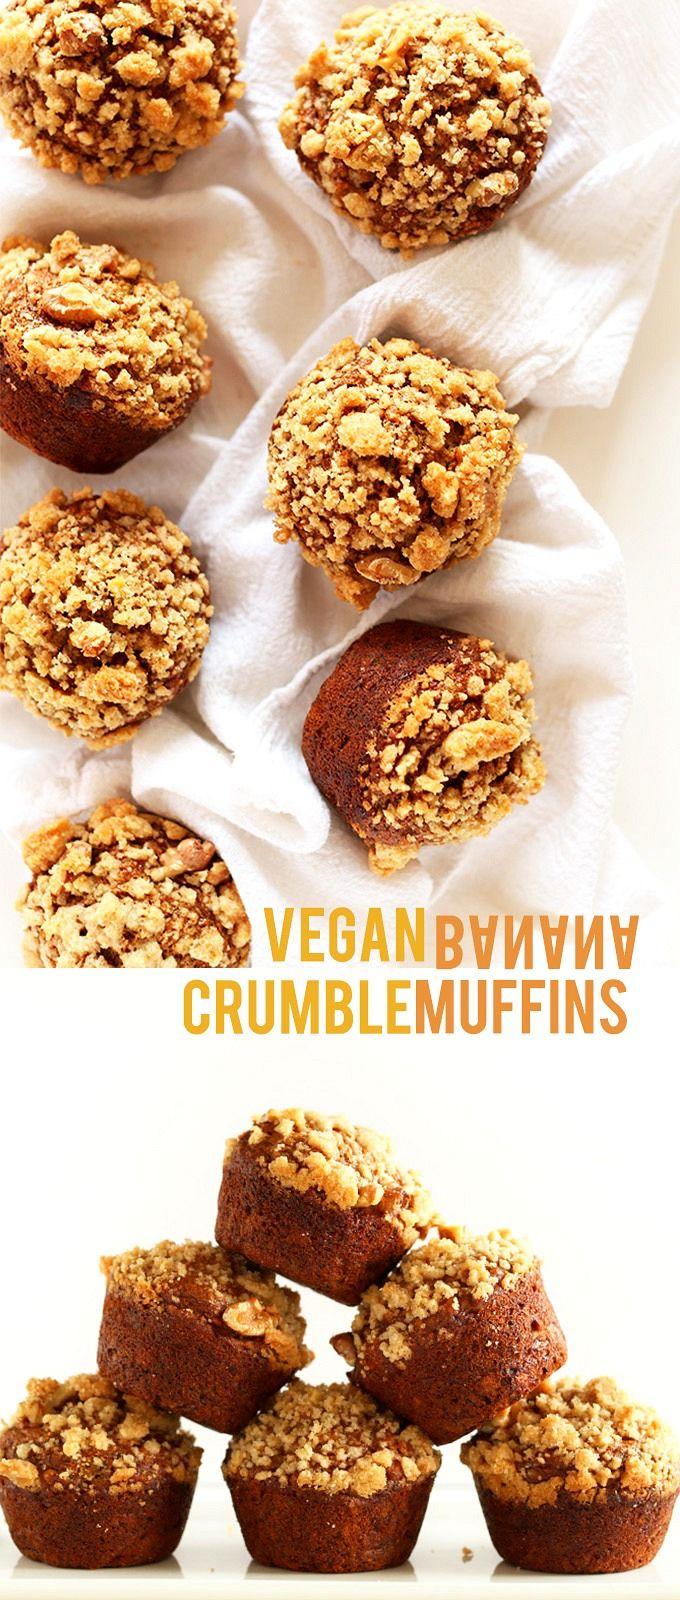 Vegan Banana Crumble Muffins! Healthy, 30 minutes, 1 bowl   minimalistbaker.com #vegan